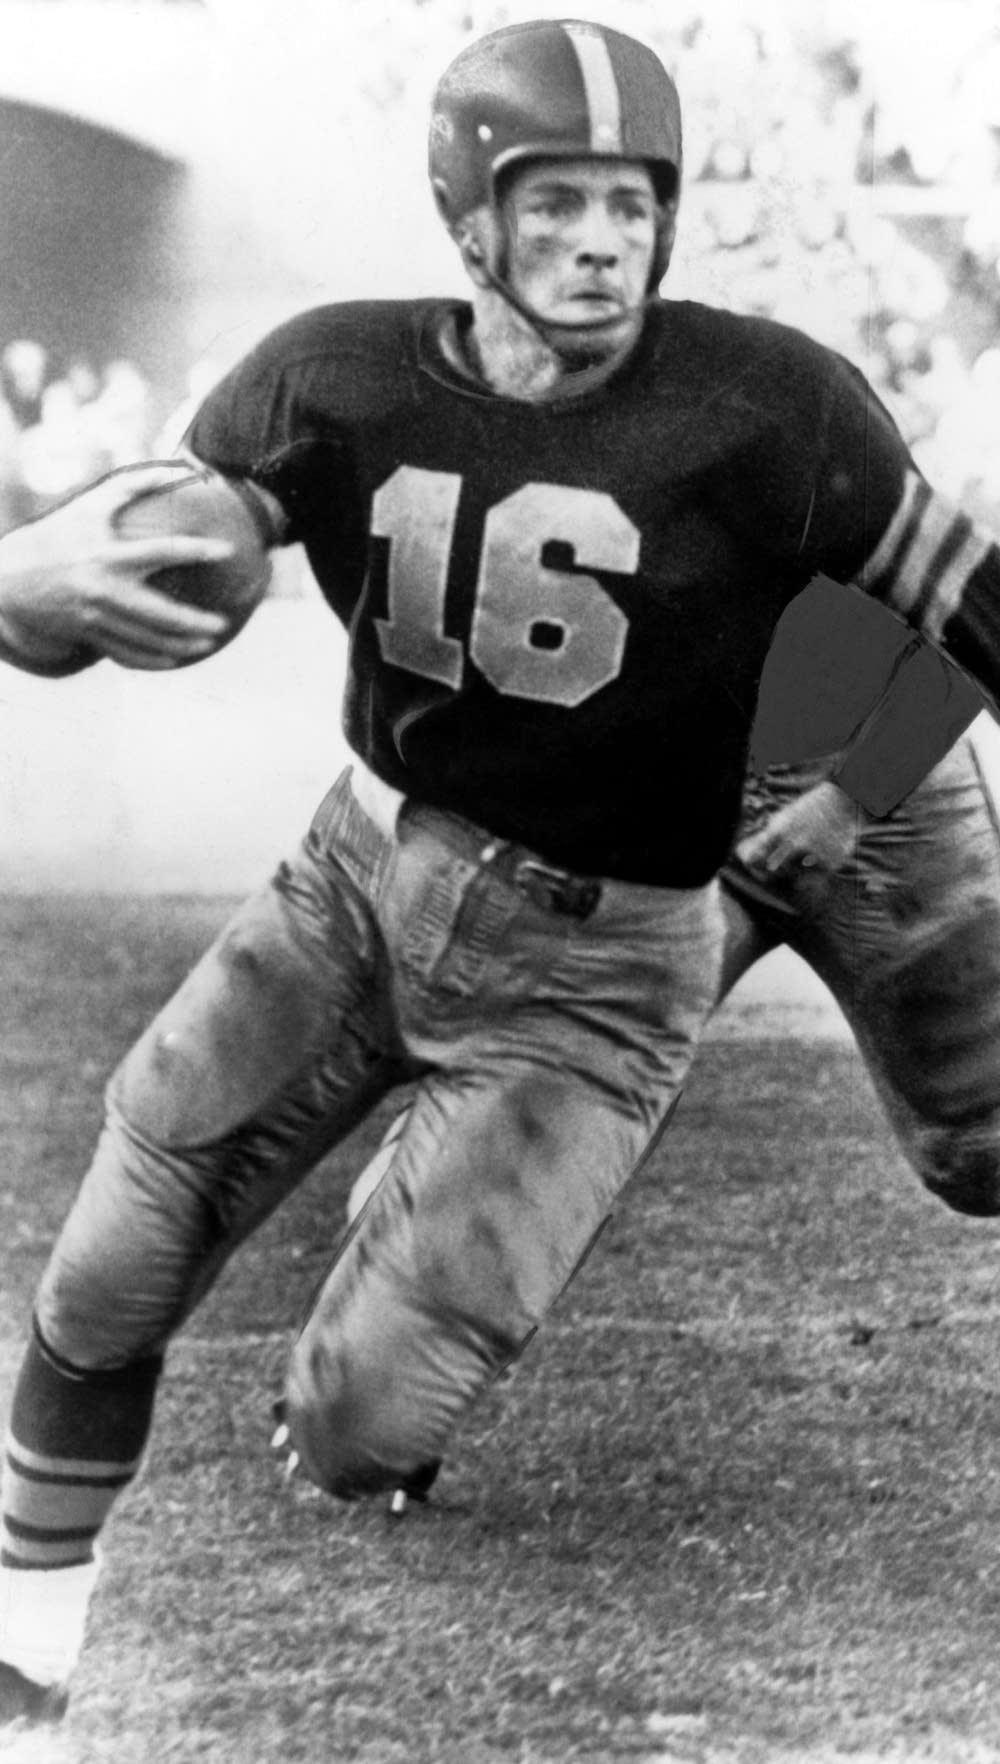 Pro Football Hall of Famer Frank Gifford dies at 84 | MPR News